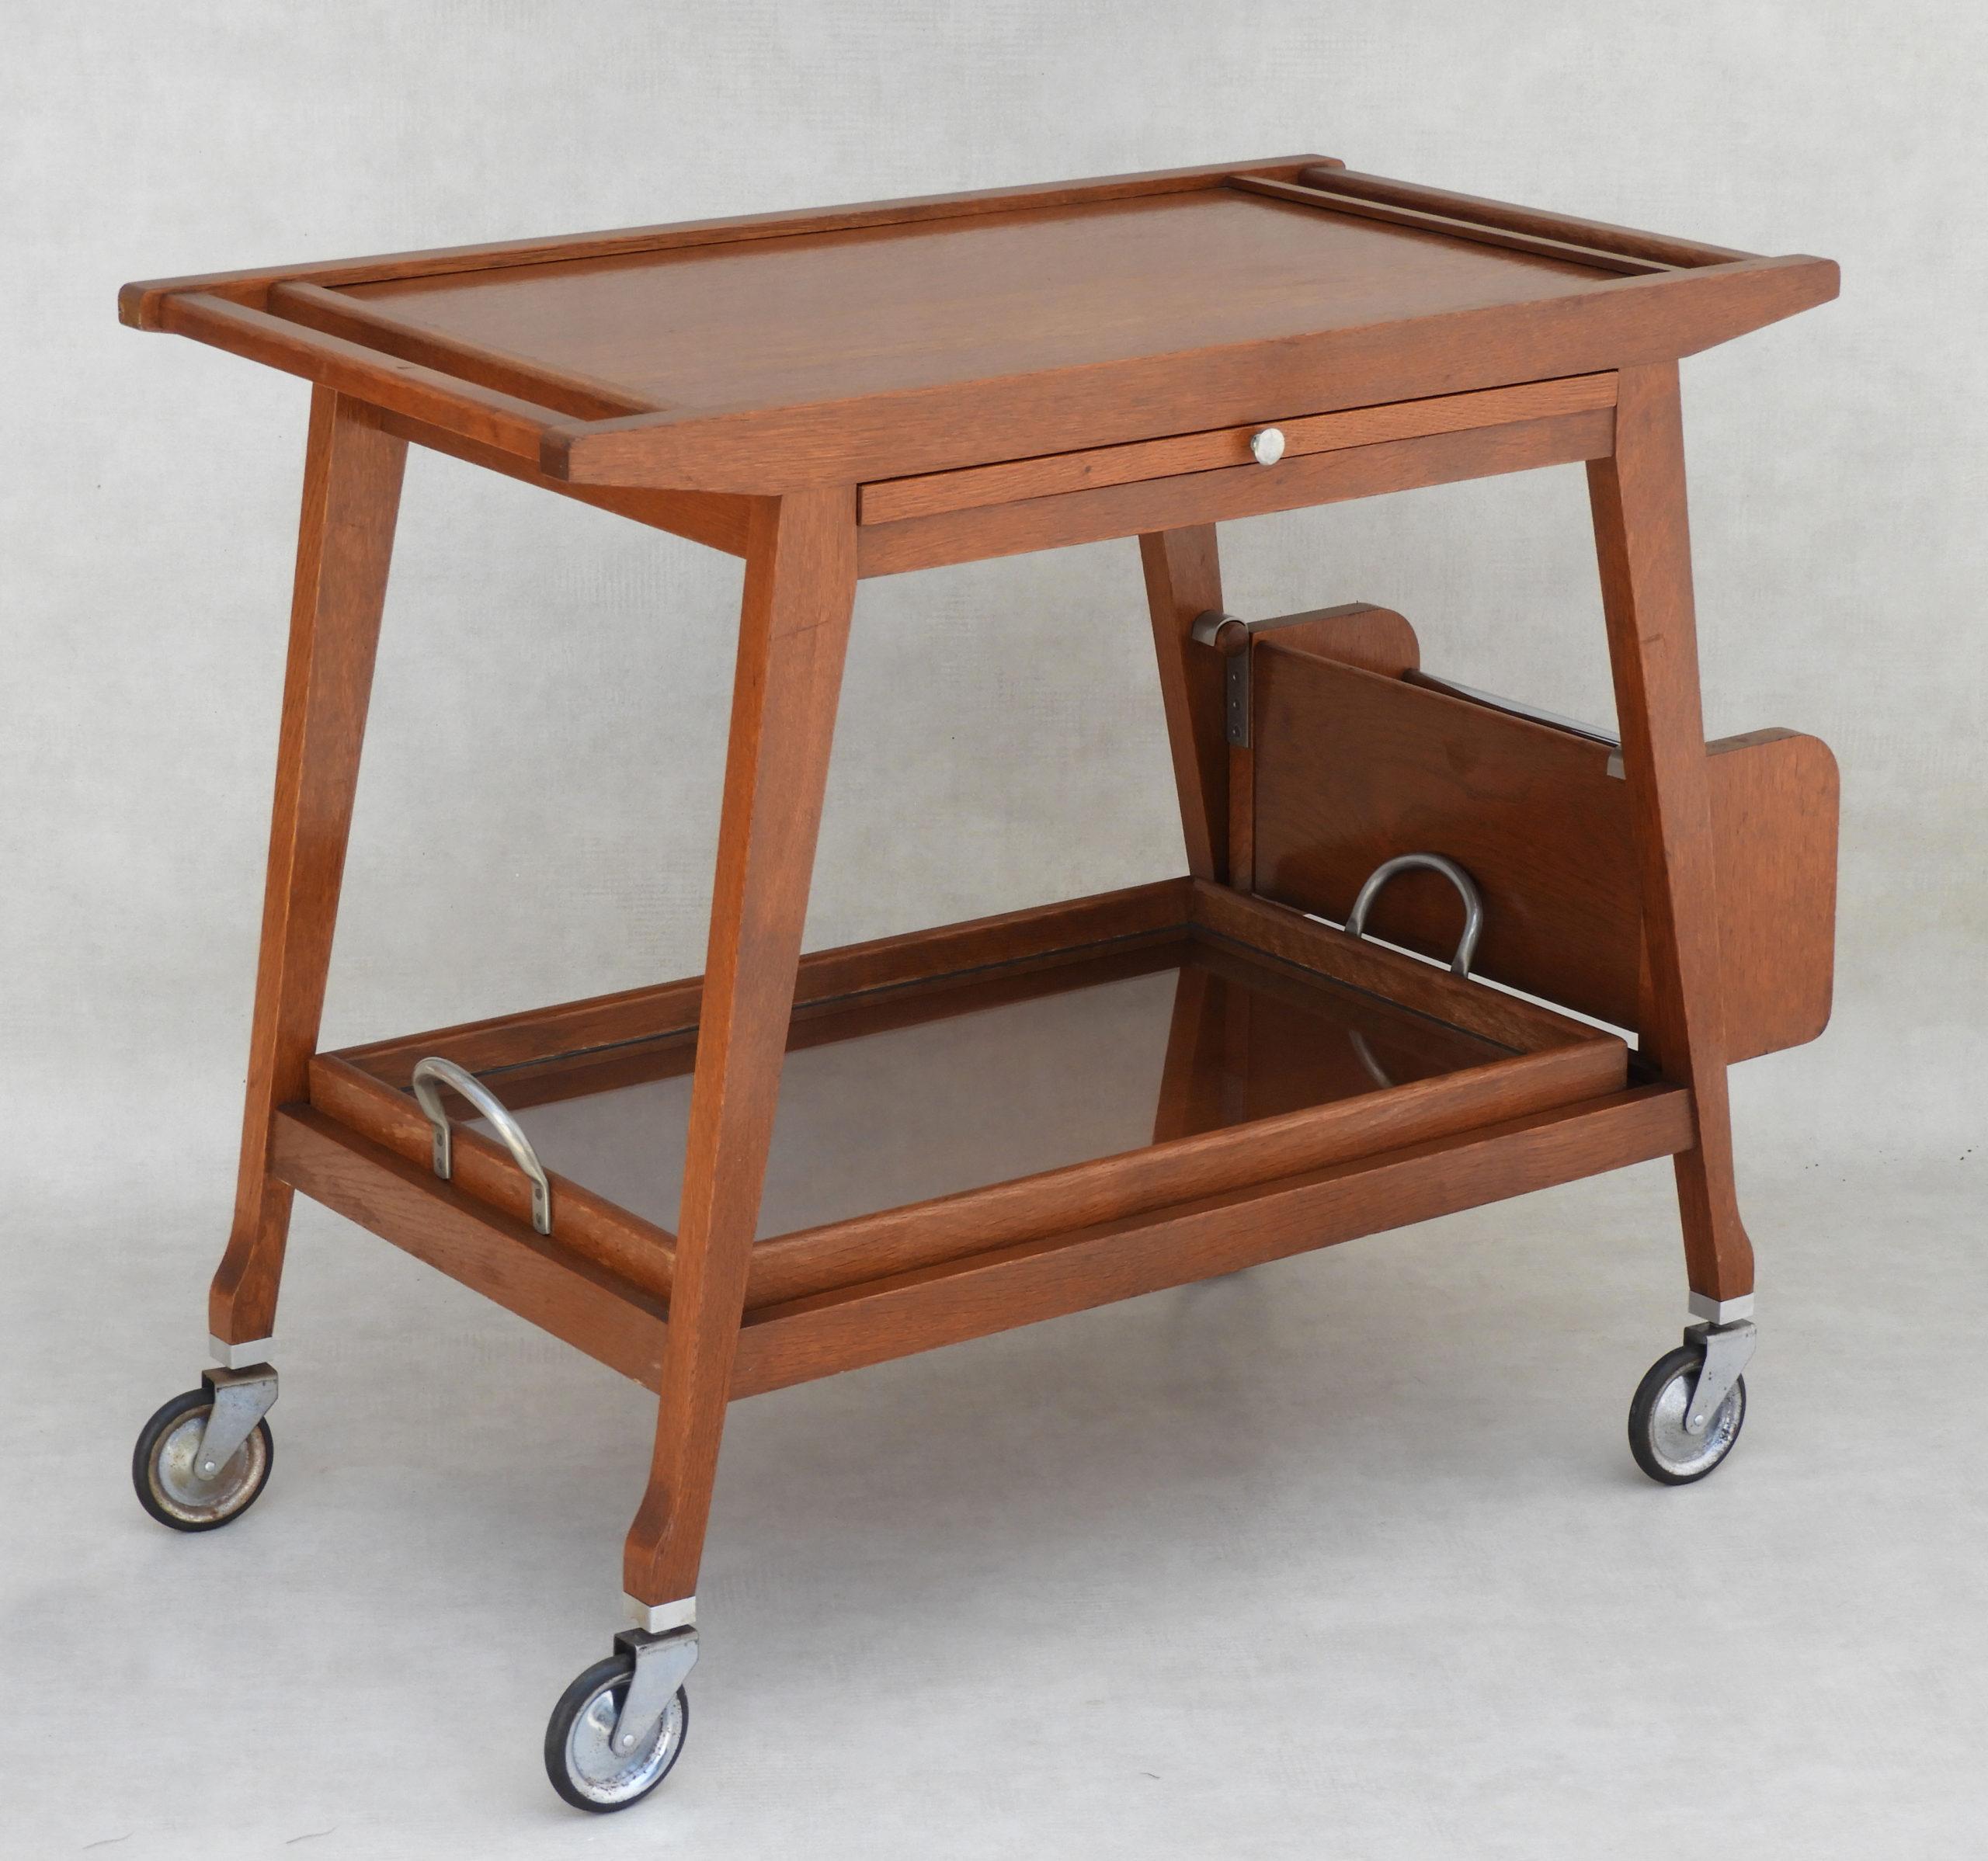 Vintage Mid Century Bar Cart Serving Trolley 1960s France Atelier33bis